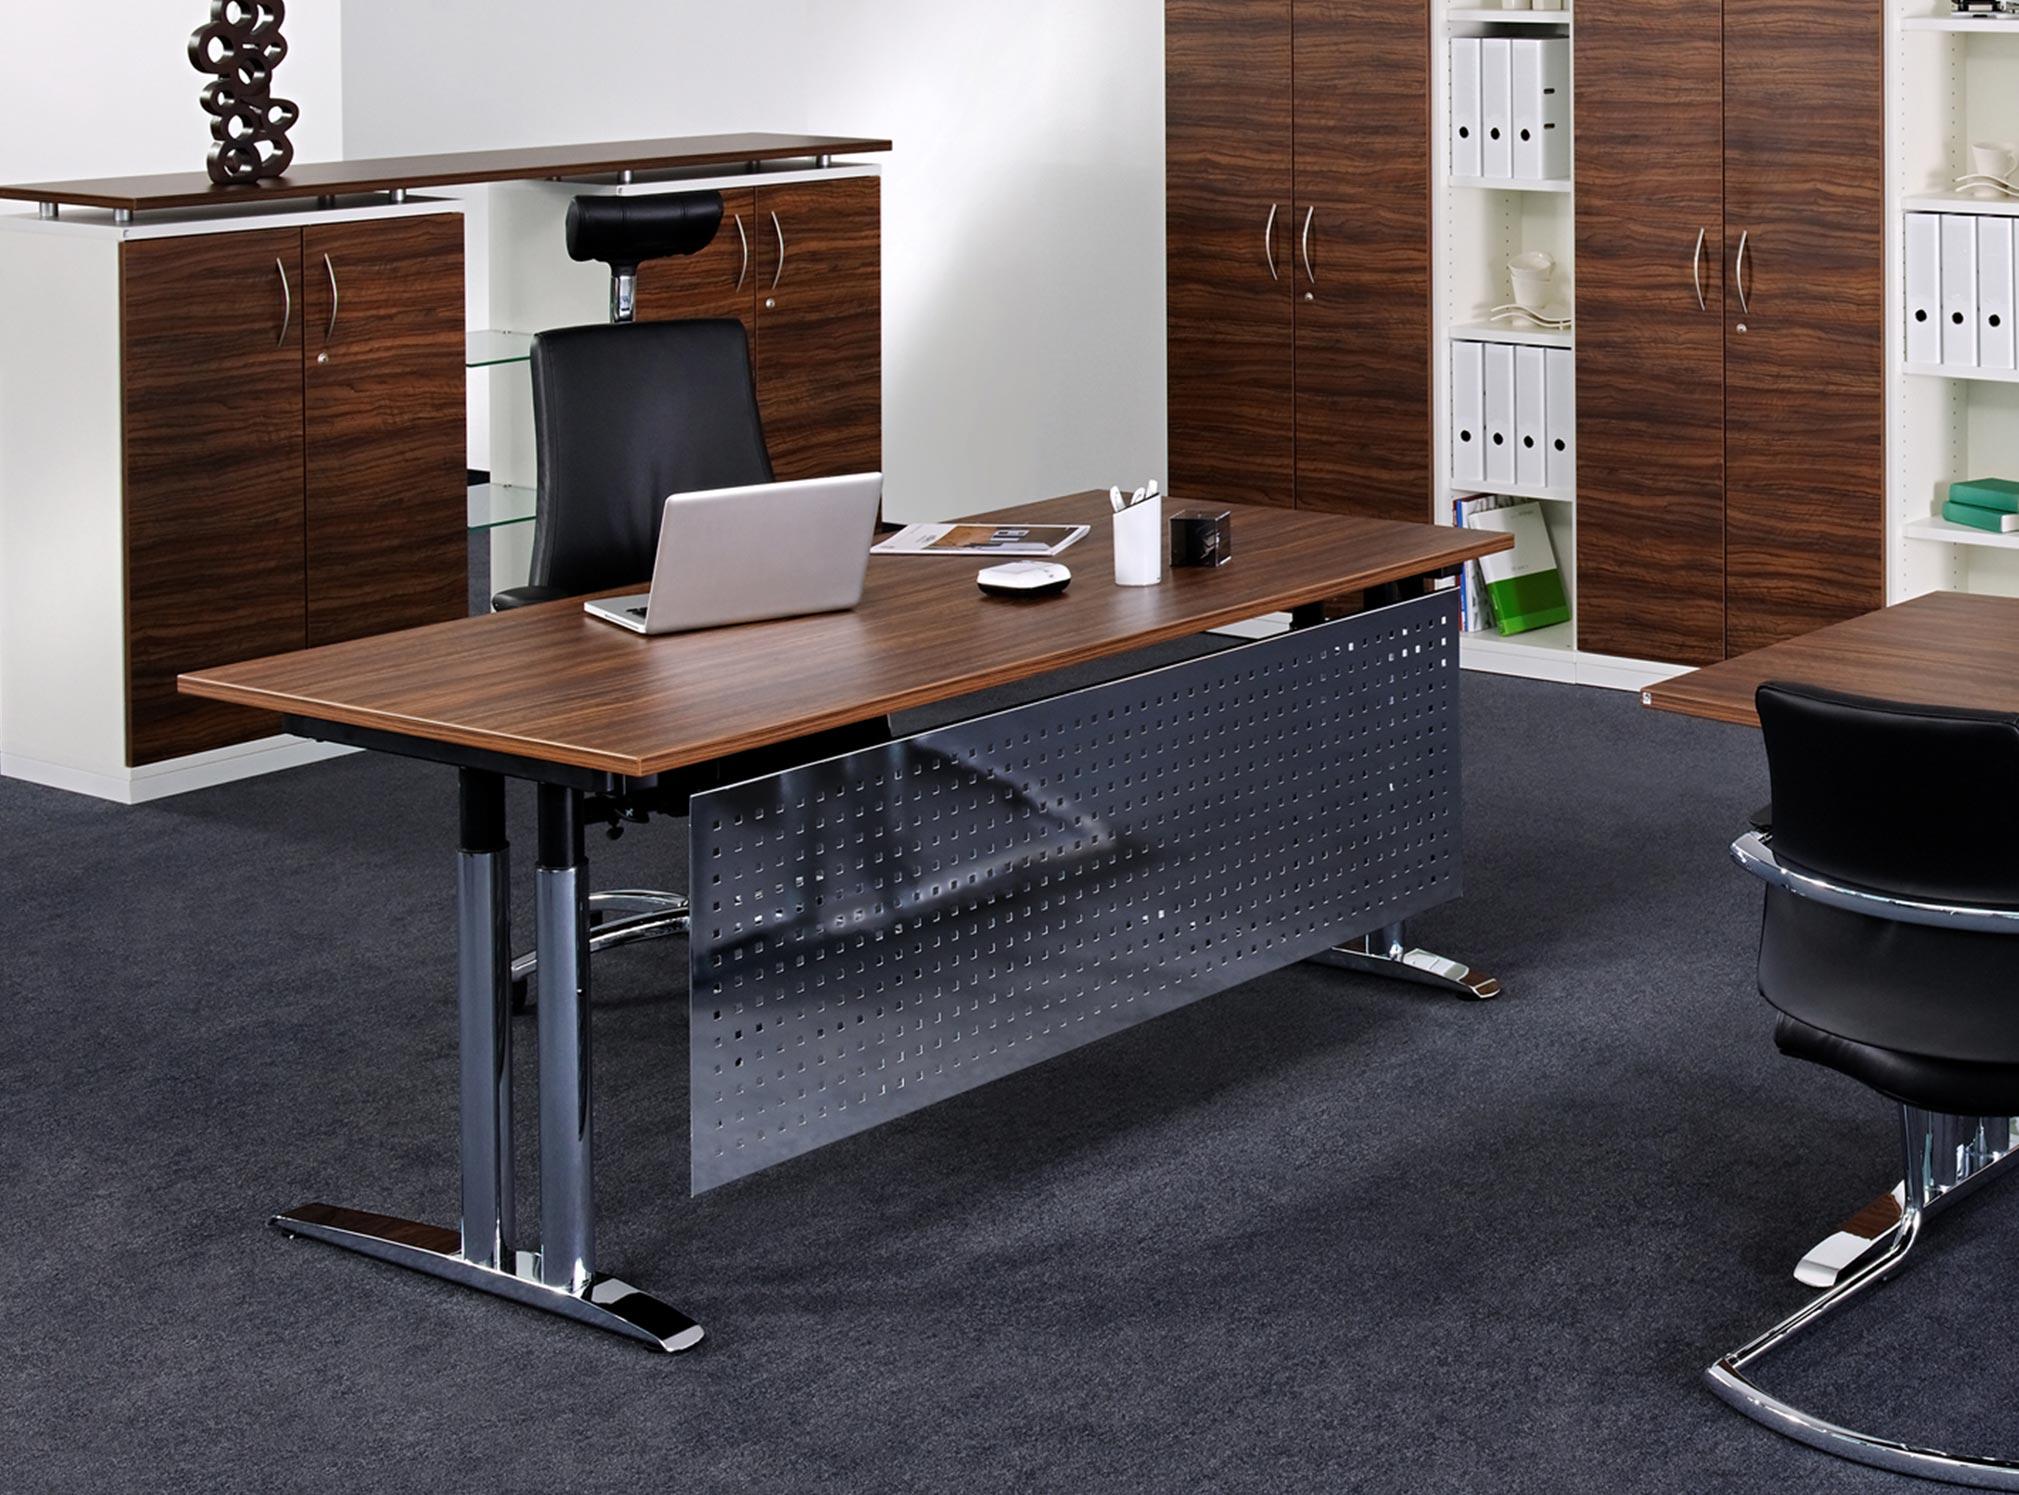 Hofmann Bürosysteme GmbH - Kassensysteme, Büro- und ...